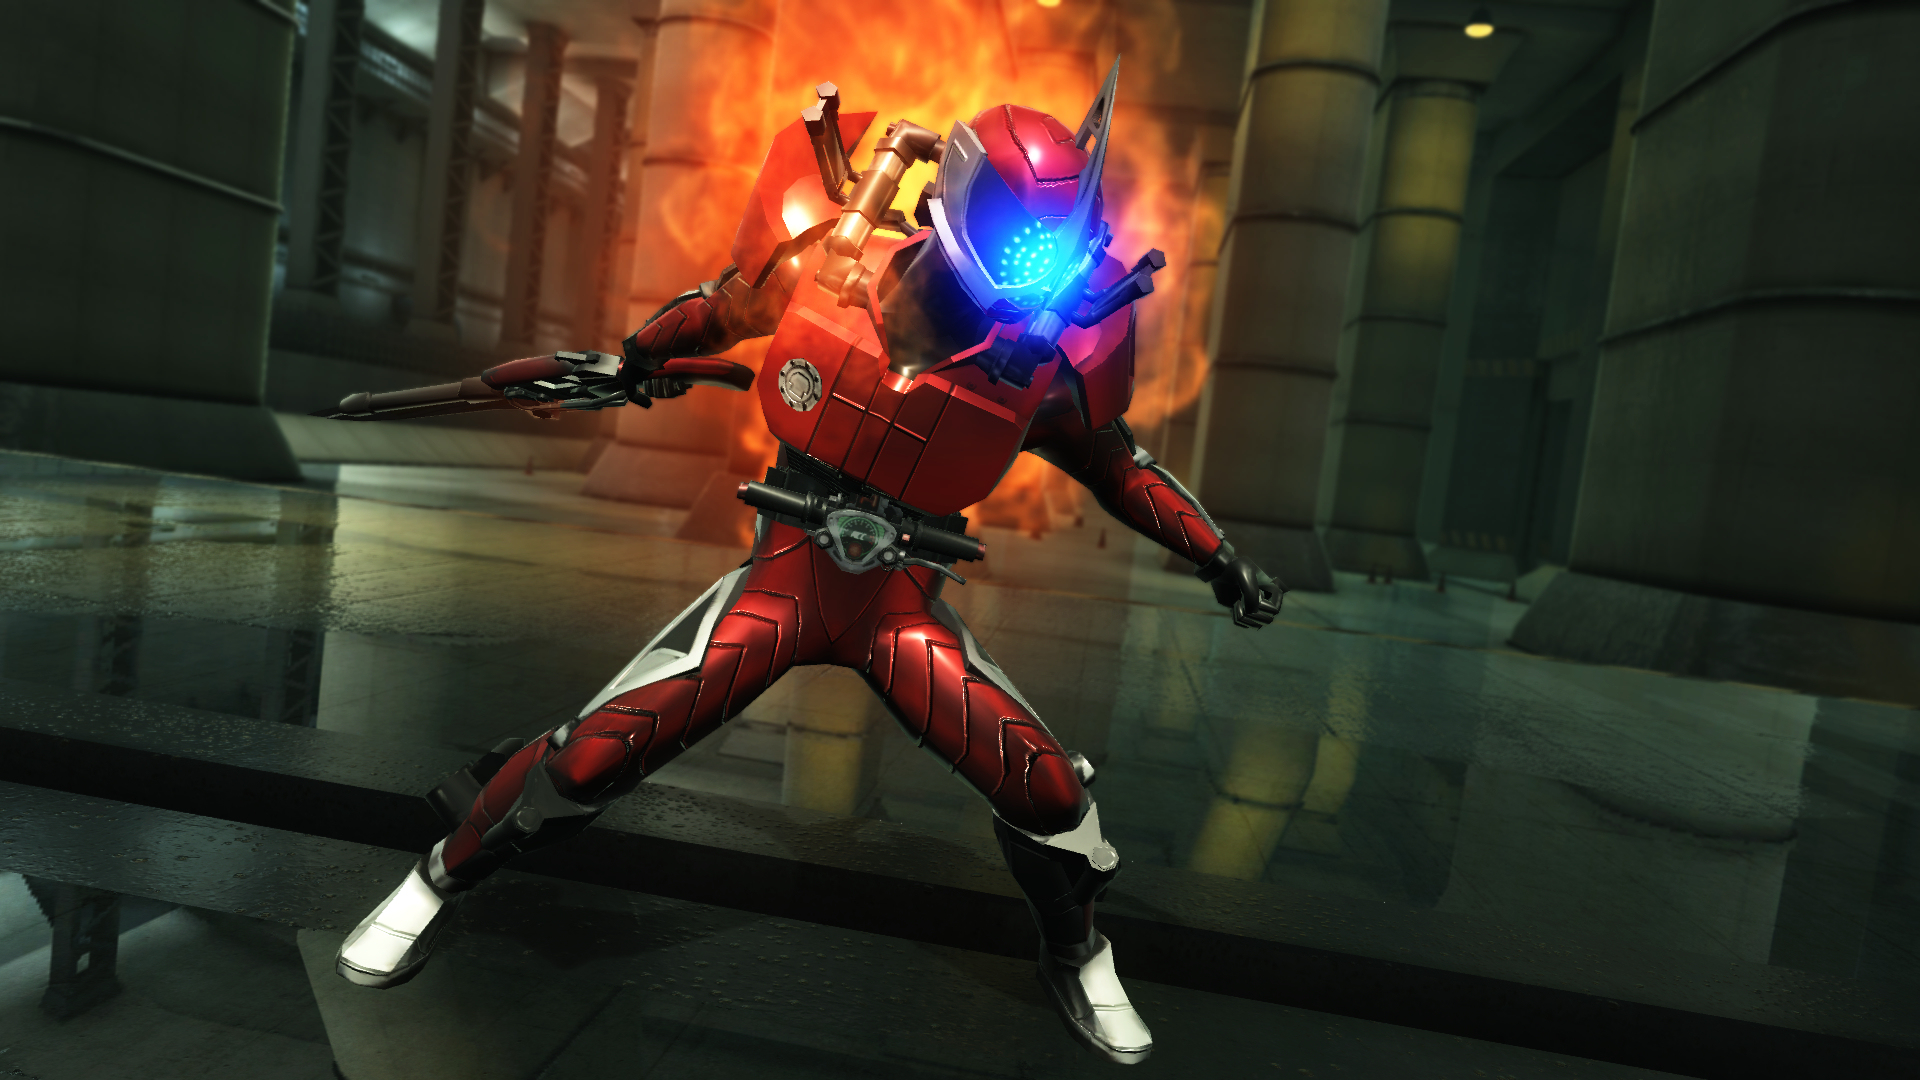 Kamen-Rider-Climax-Fighters_2017_11-27-17_013